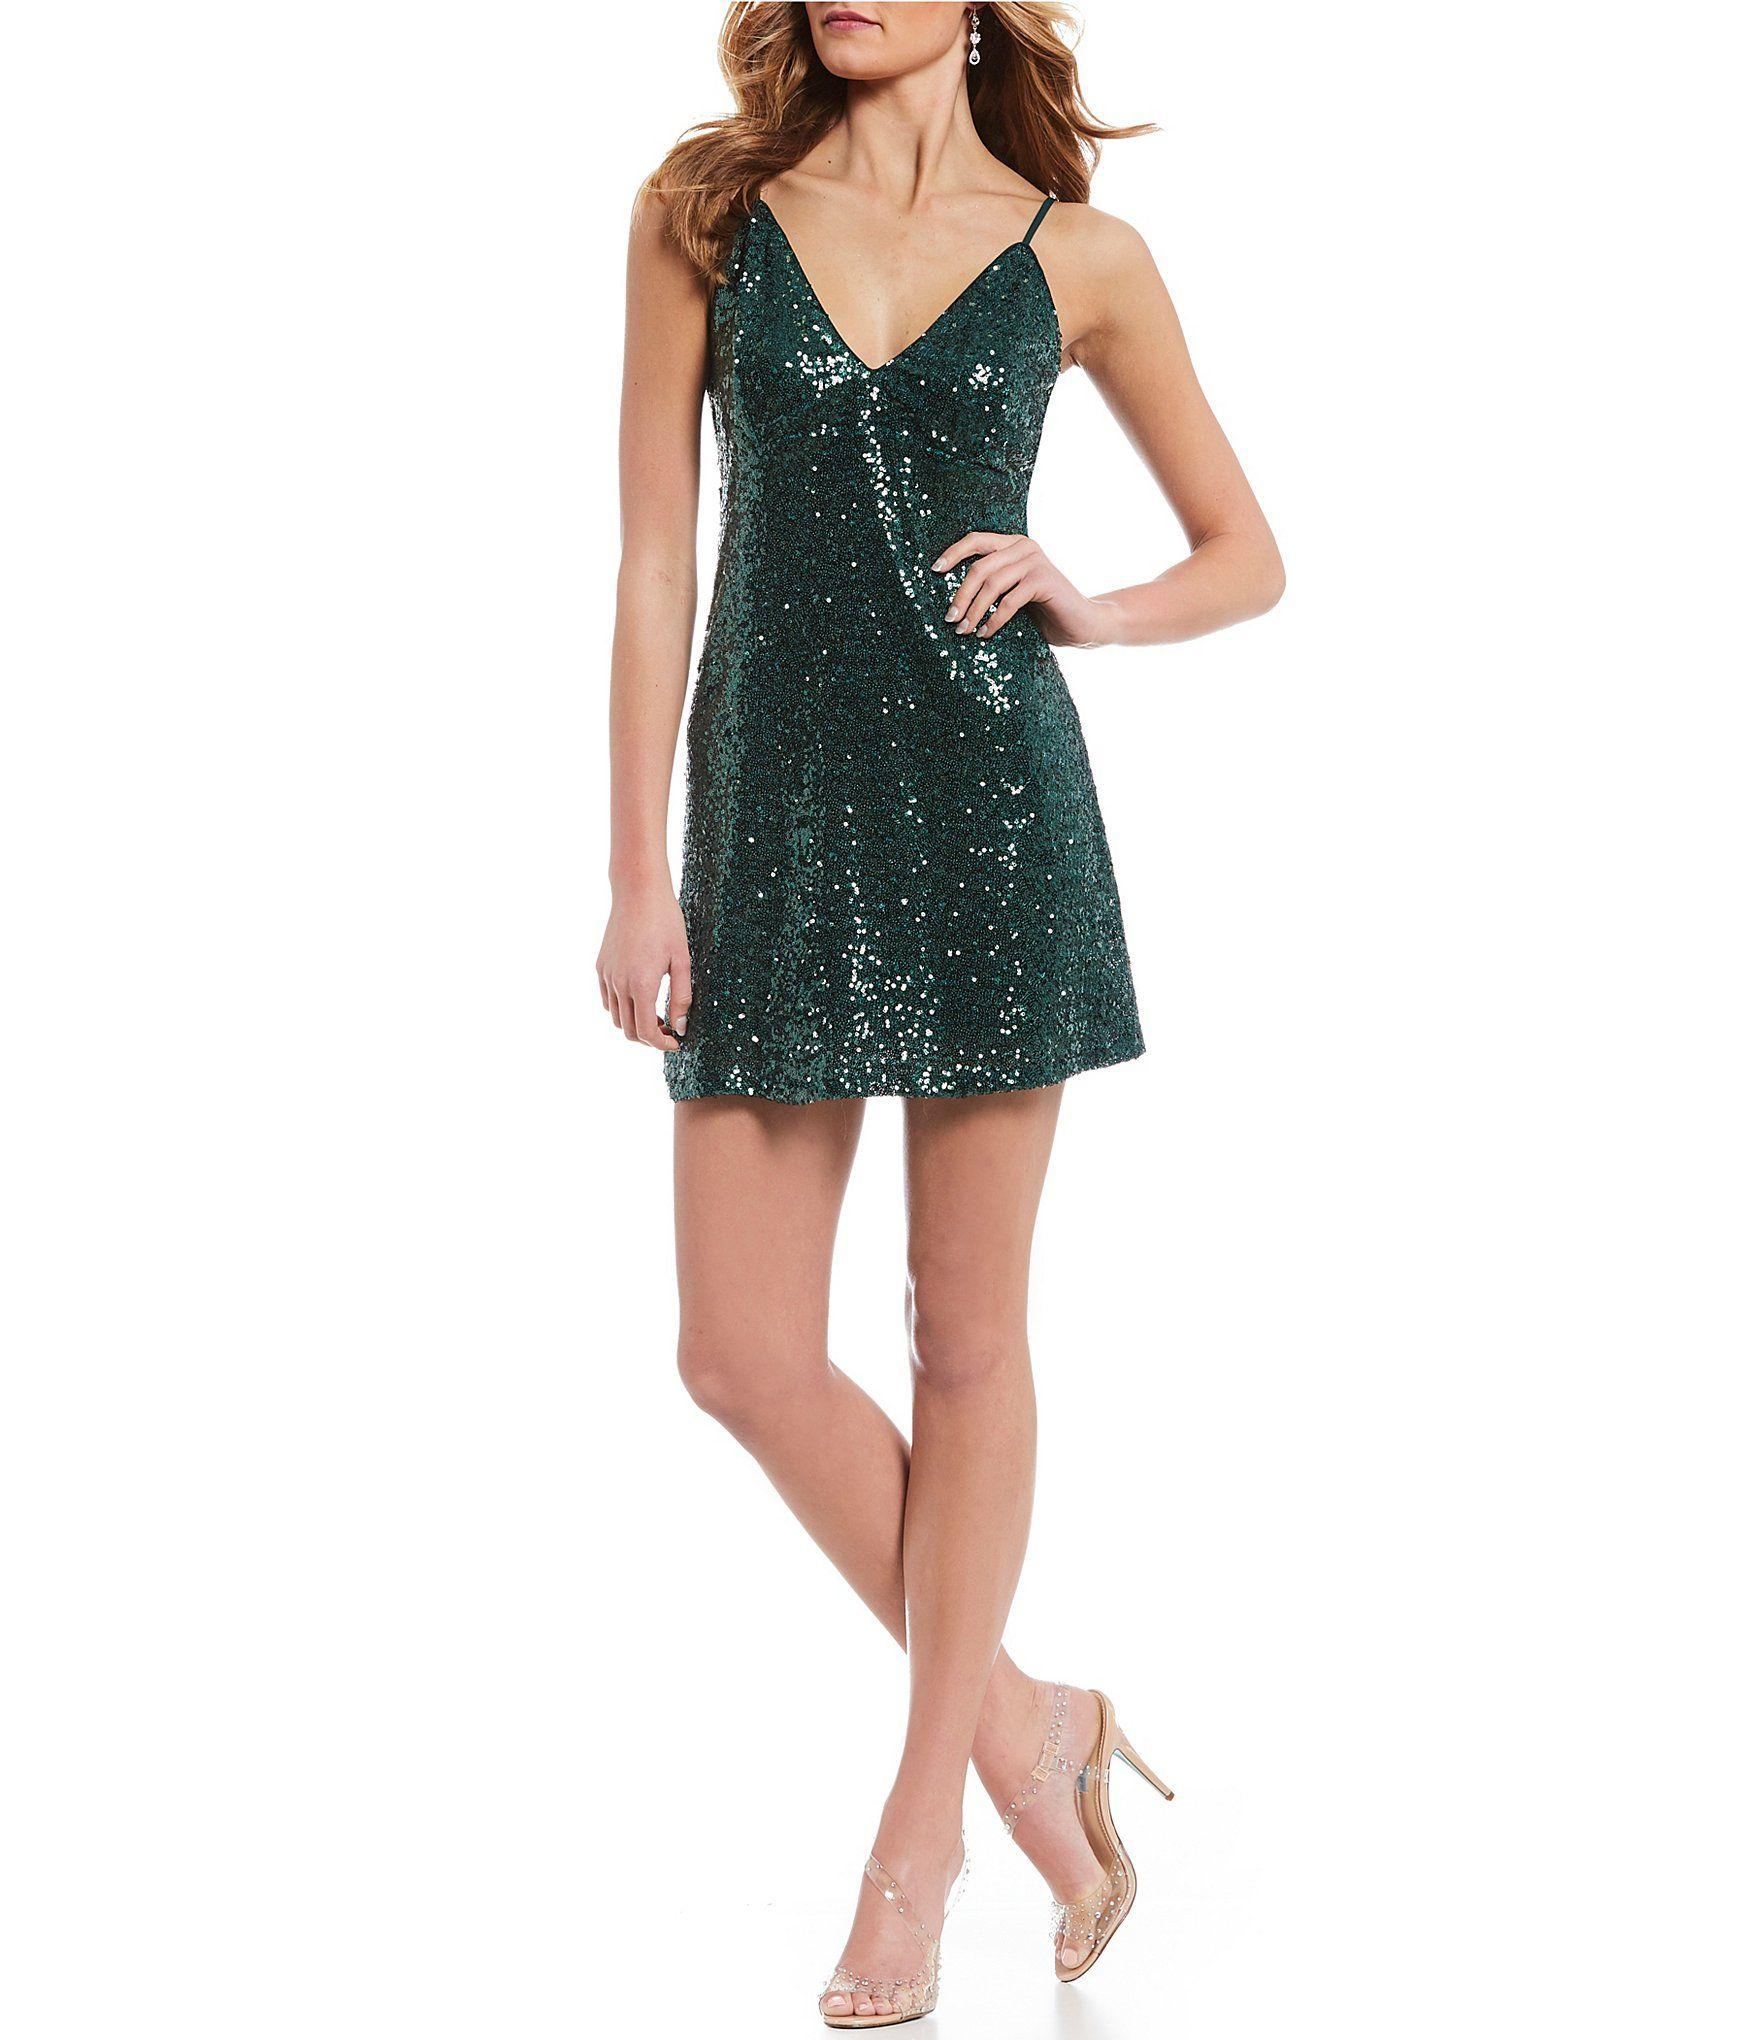 ec3a84519 Shop for Xtraordinary V-Neck Sequin Slip Dress at Dillards.com. Visit  Dillards.com to find clothing, accessories, shoes, cosmetics & more.